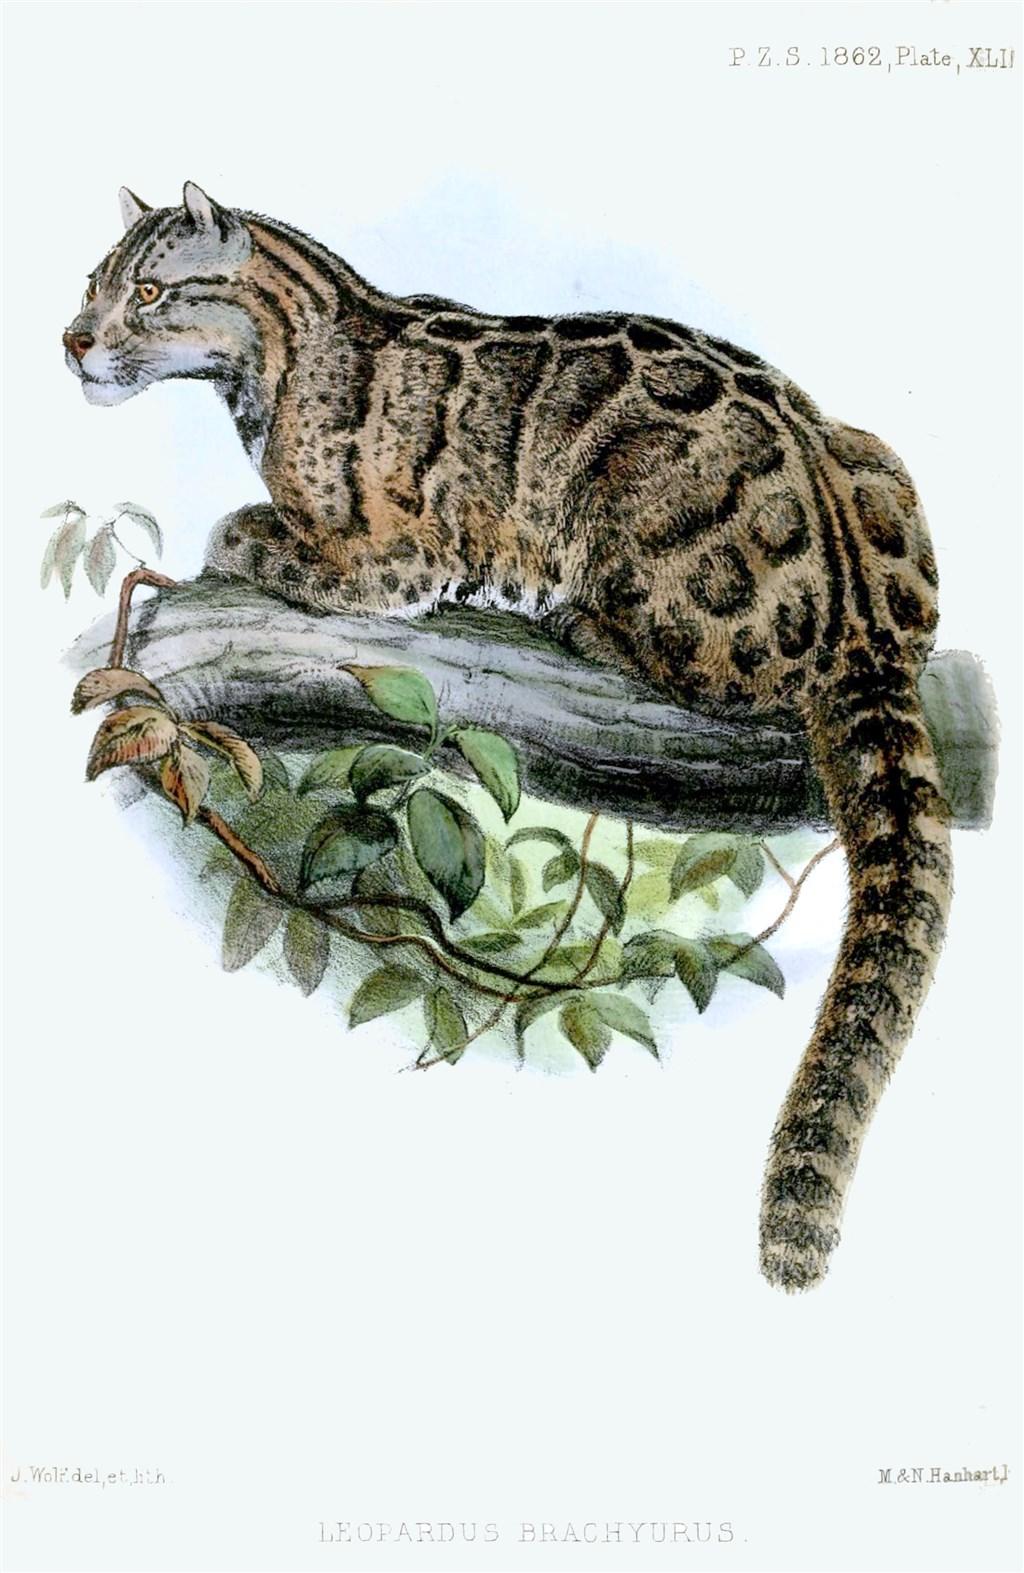 Un dibujo del leopardo nublado de Taiwan (Proceedings of the Zoological Society of London 1862)